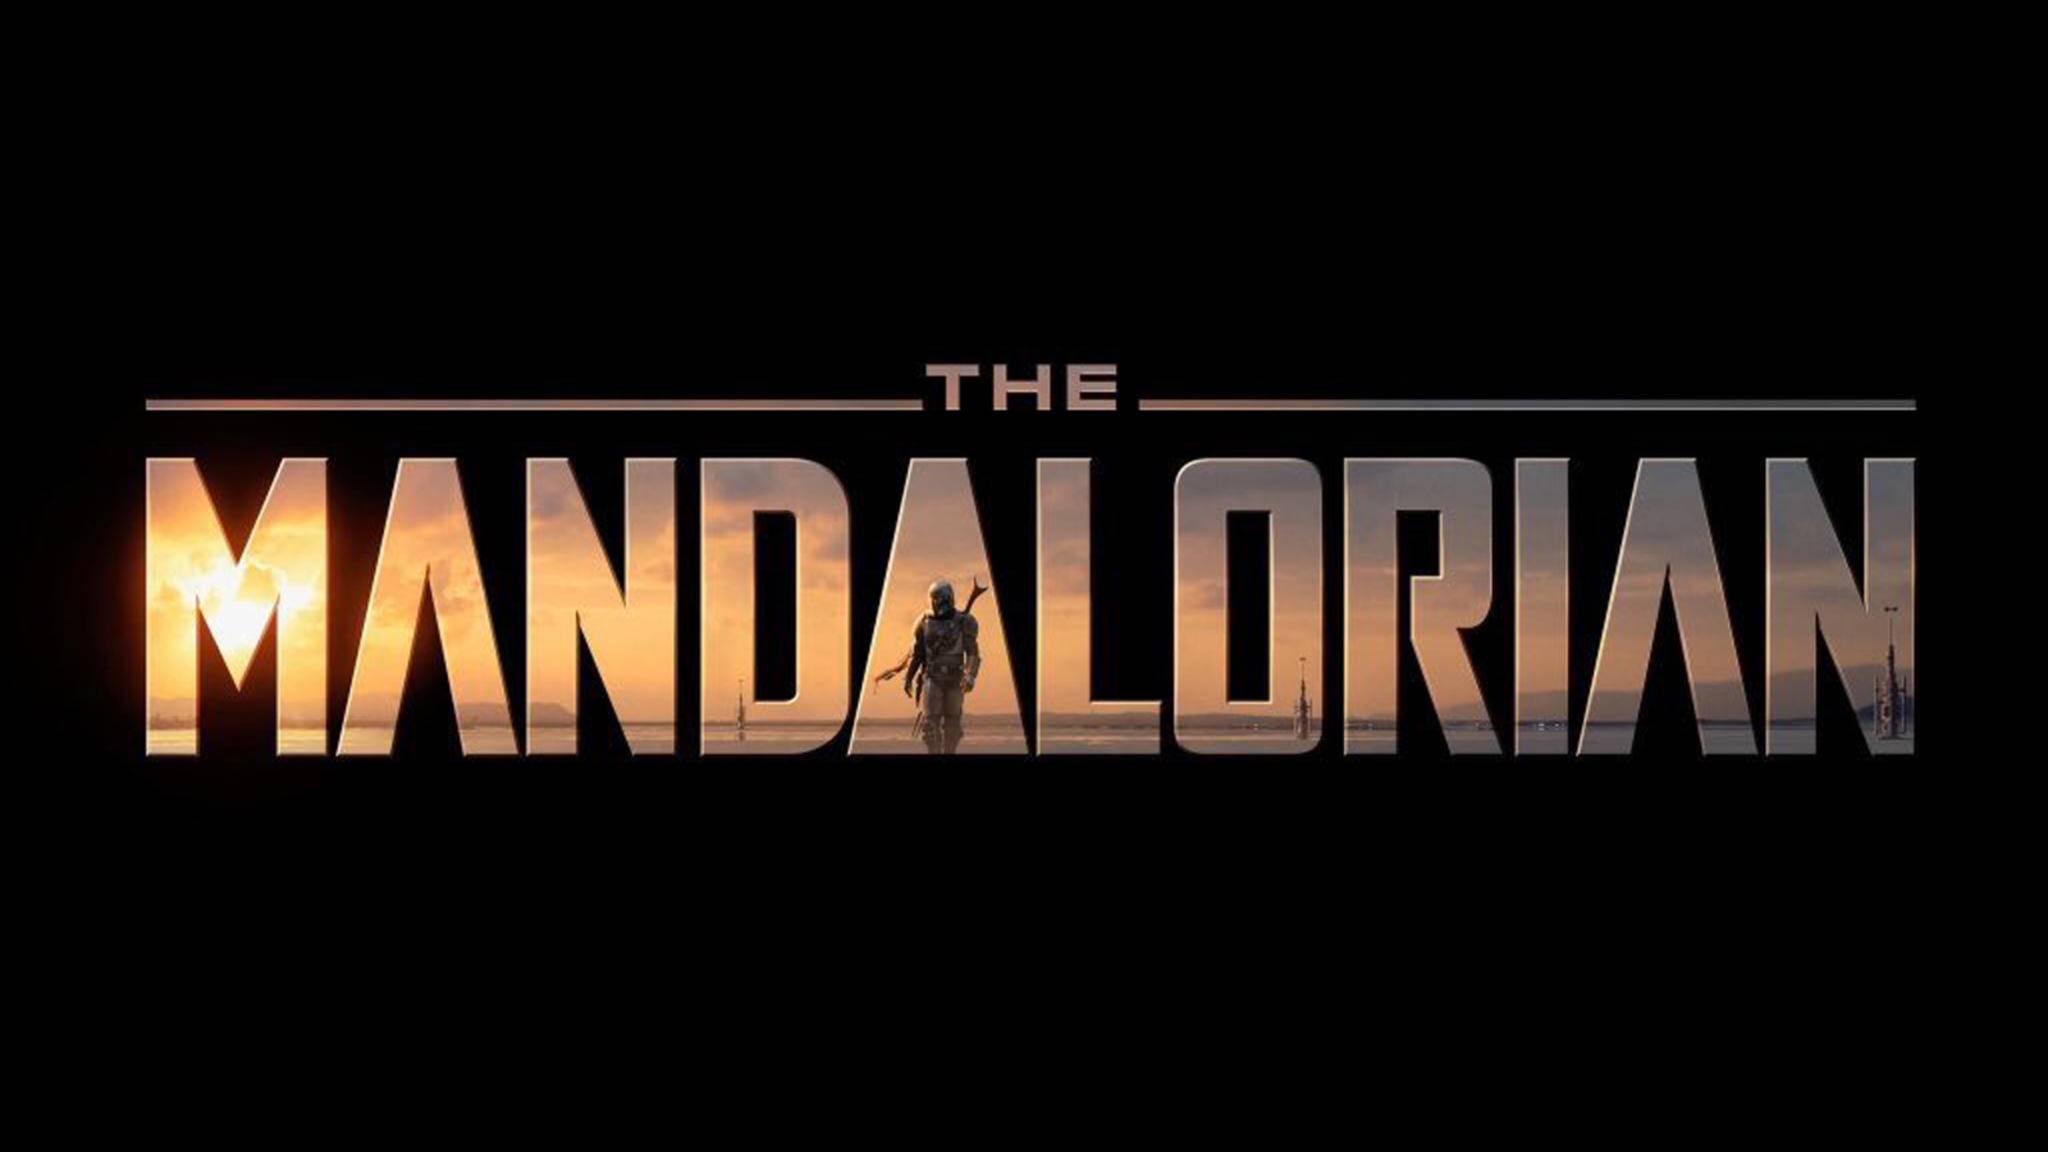 """The Mandalorian"" startet am 12. November auf Disney+ durch."